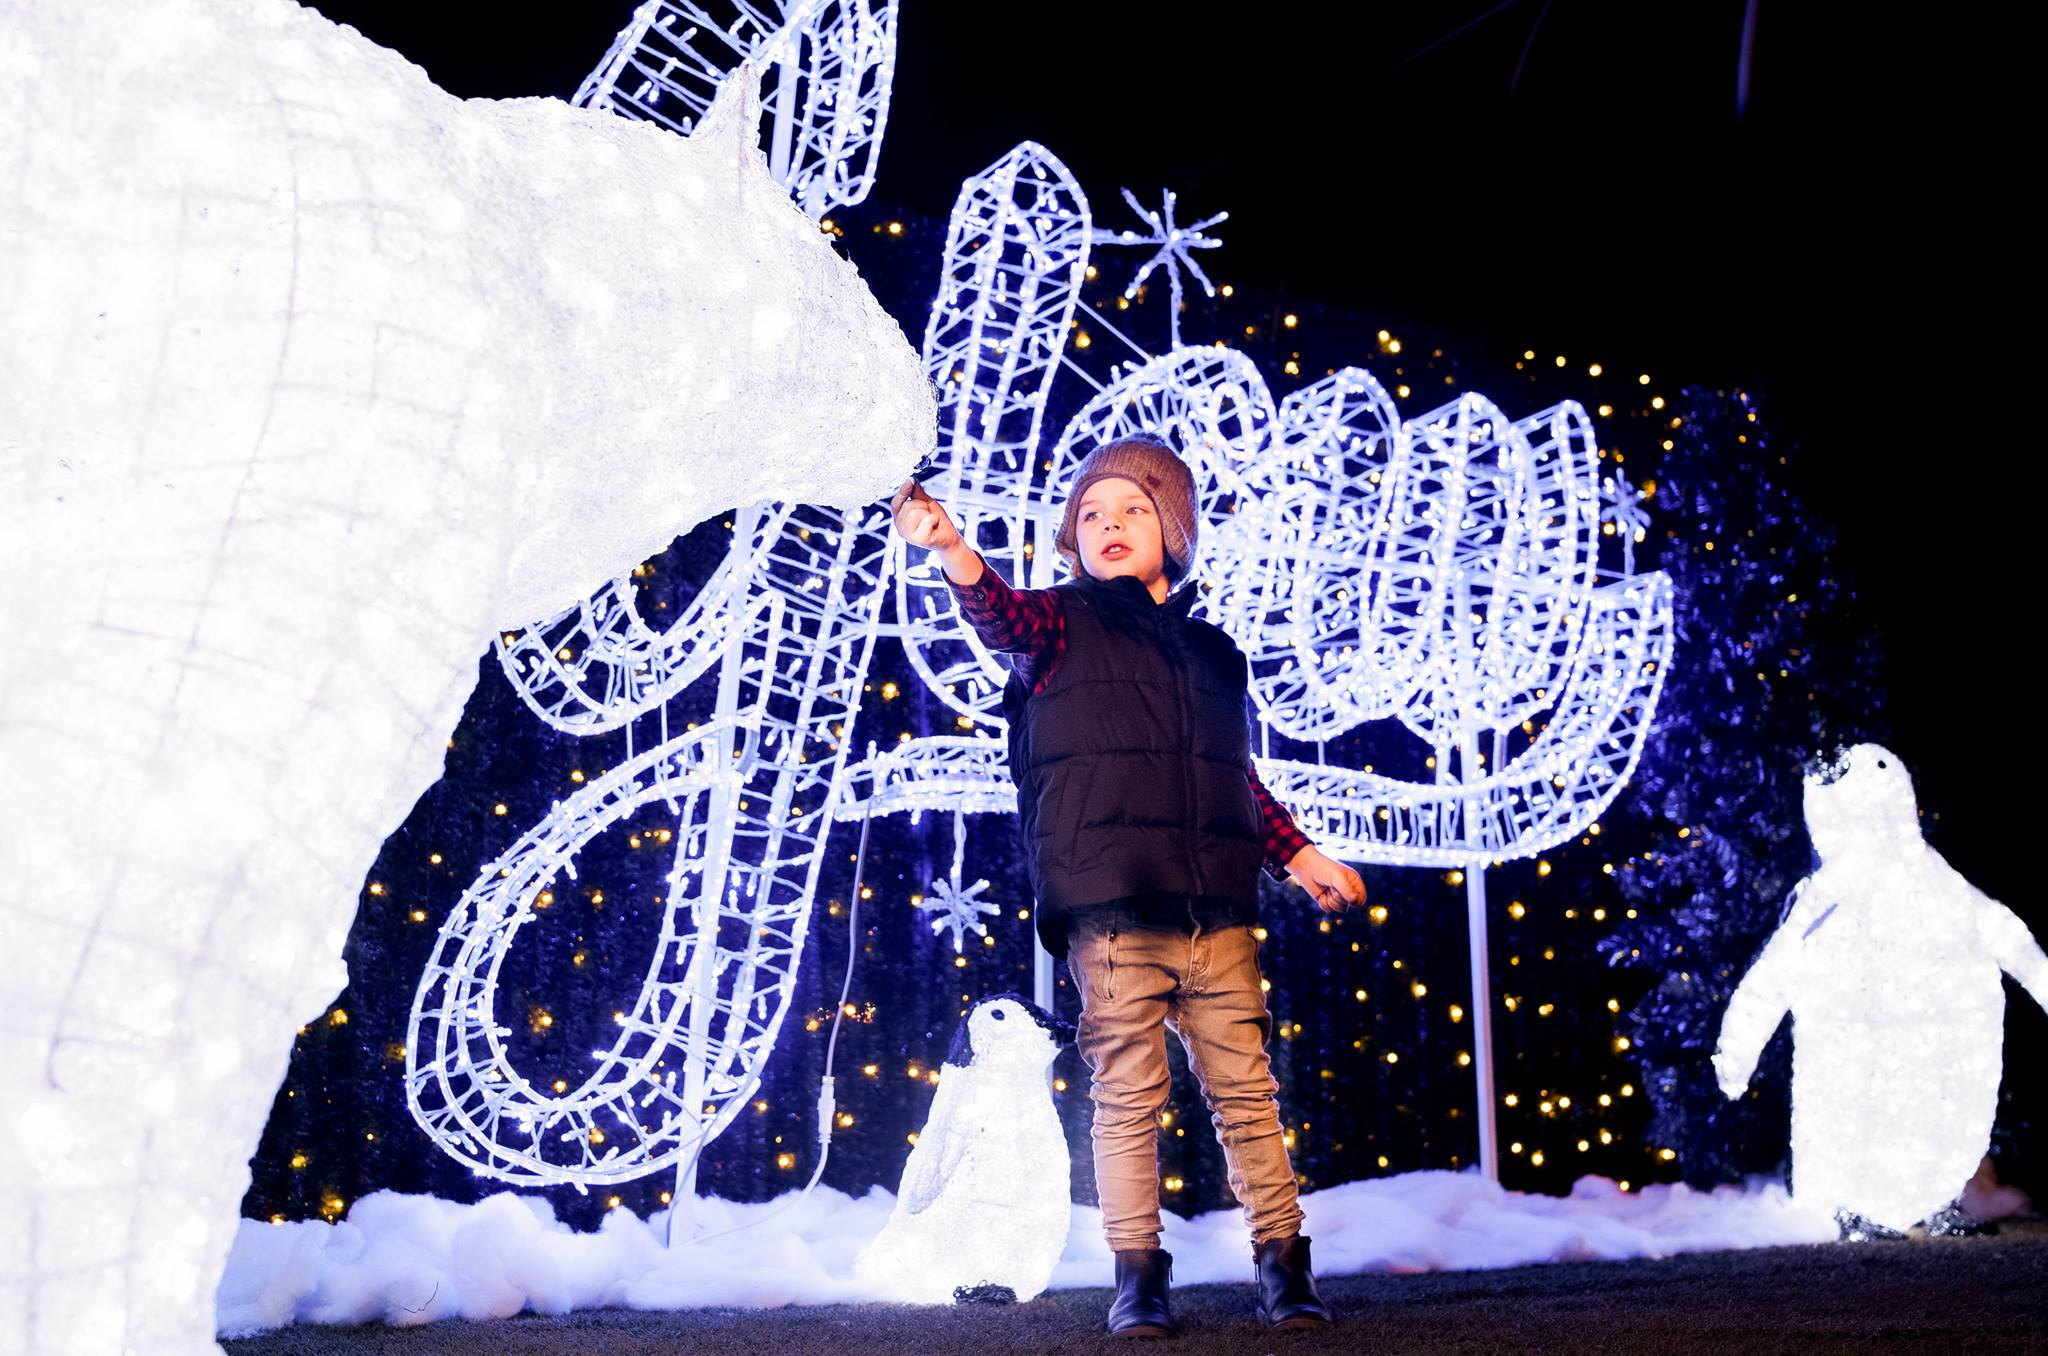 Merveilleux Glow Christmas Light Garden And Market Nov. 24 To Dec. 30, 2017